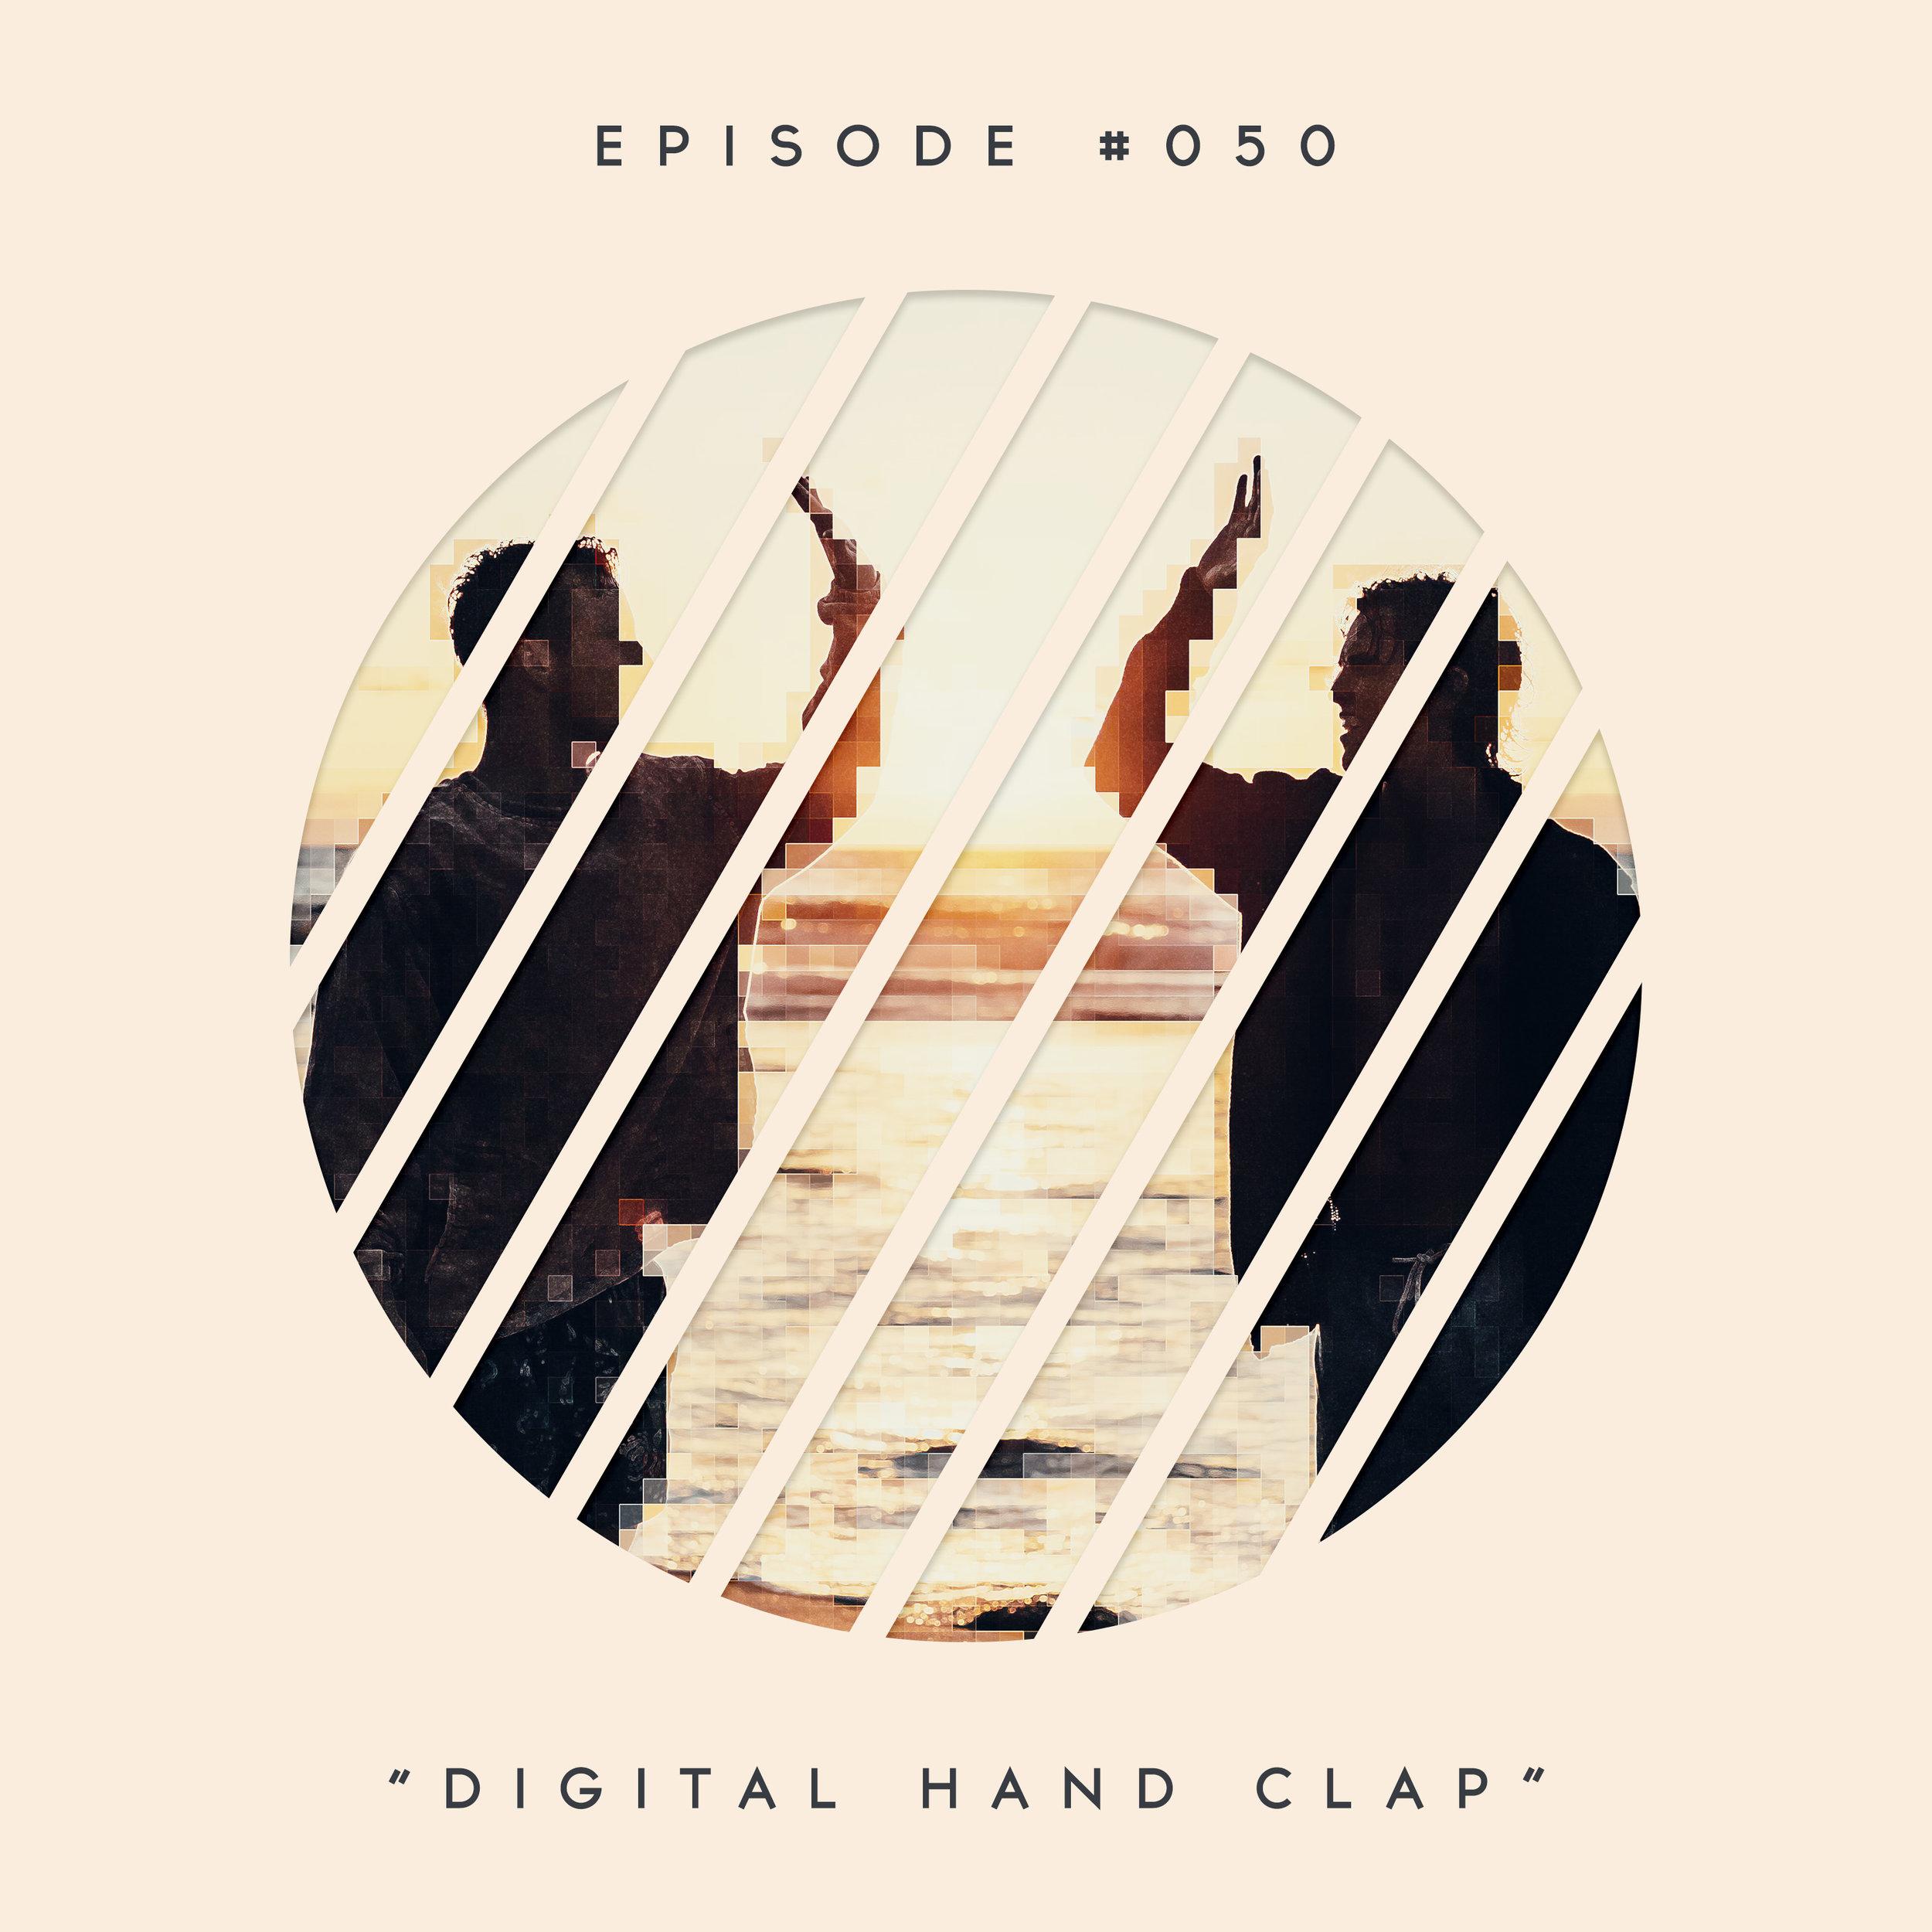 Digital-Hand-Clap.jpg